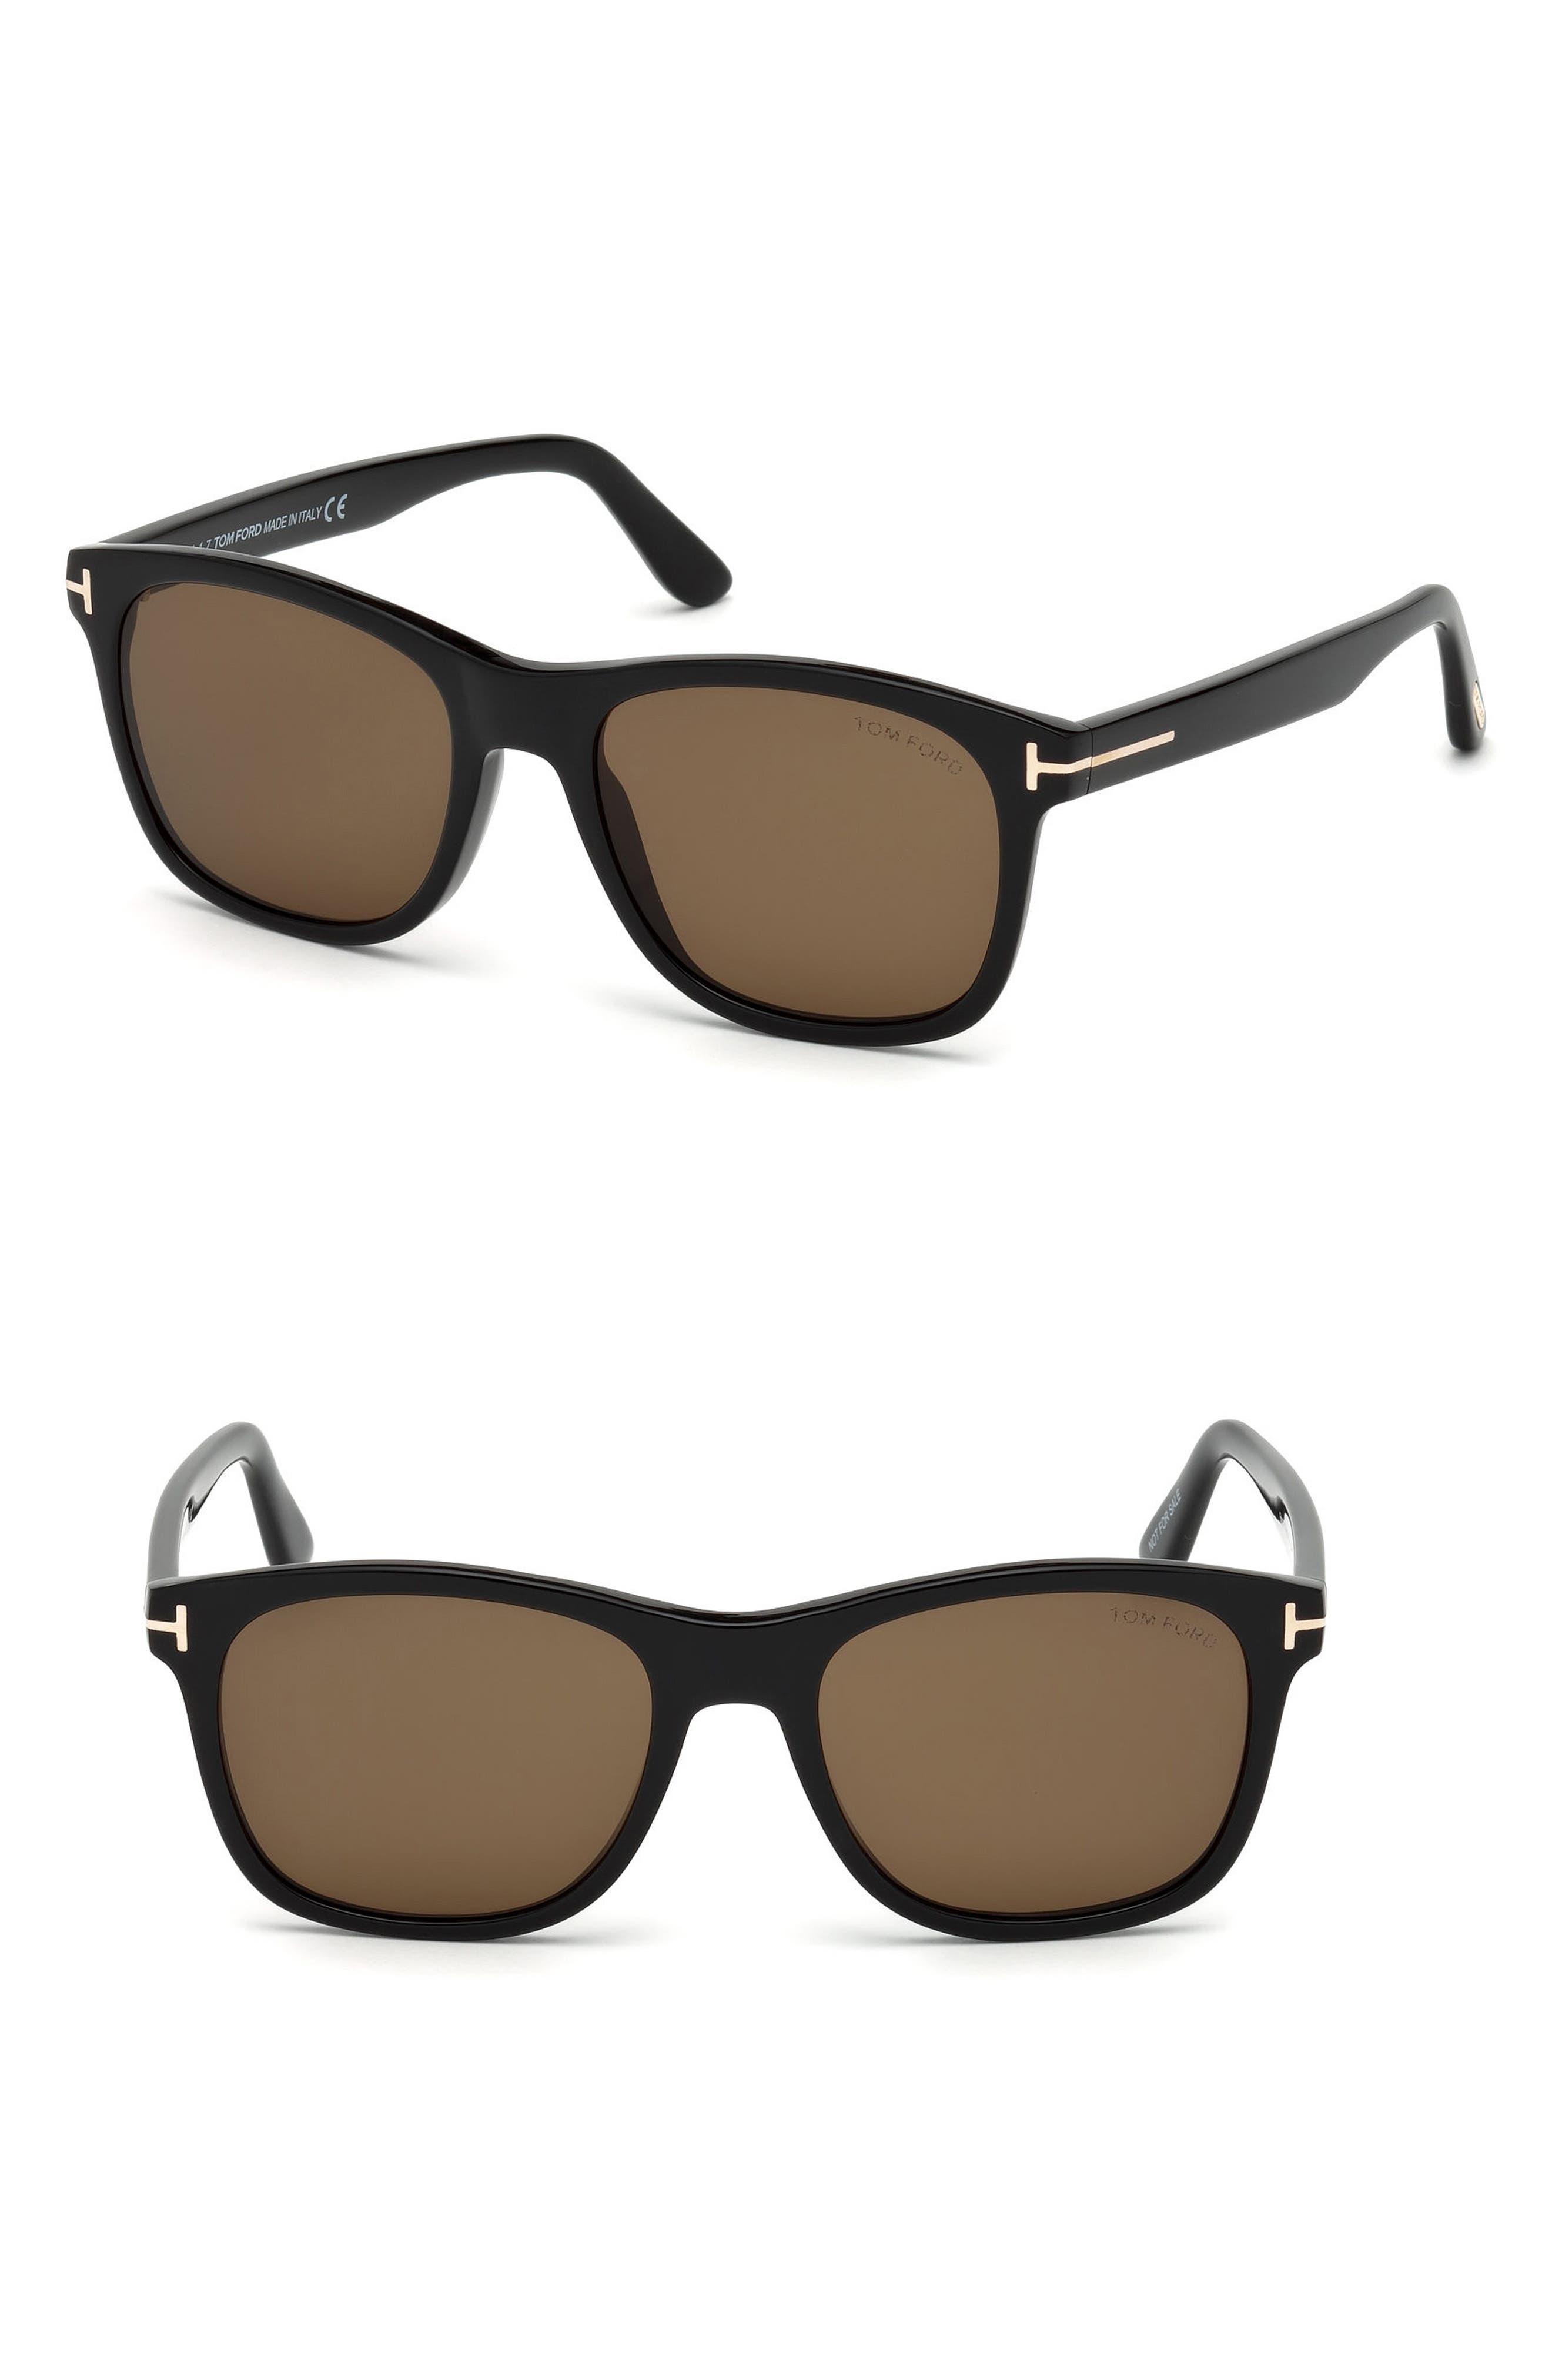 Eric 55mm Sunglasses,                         Main,                         color, 015